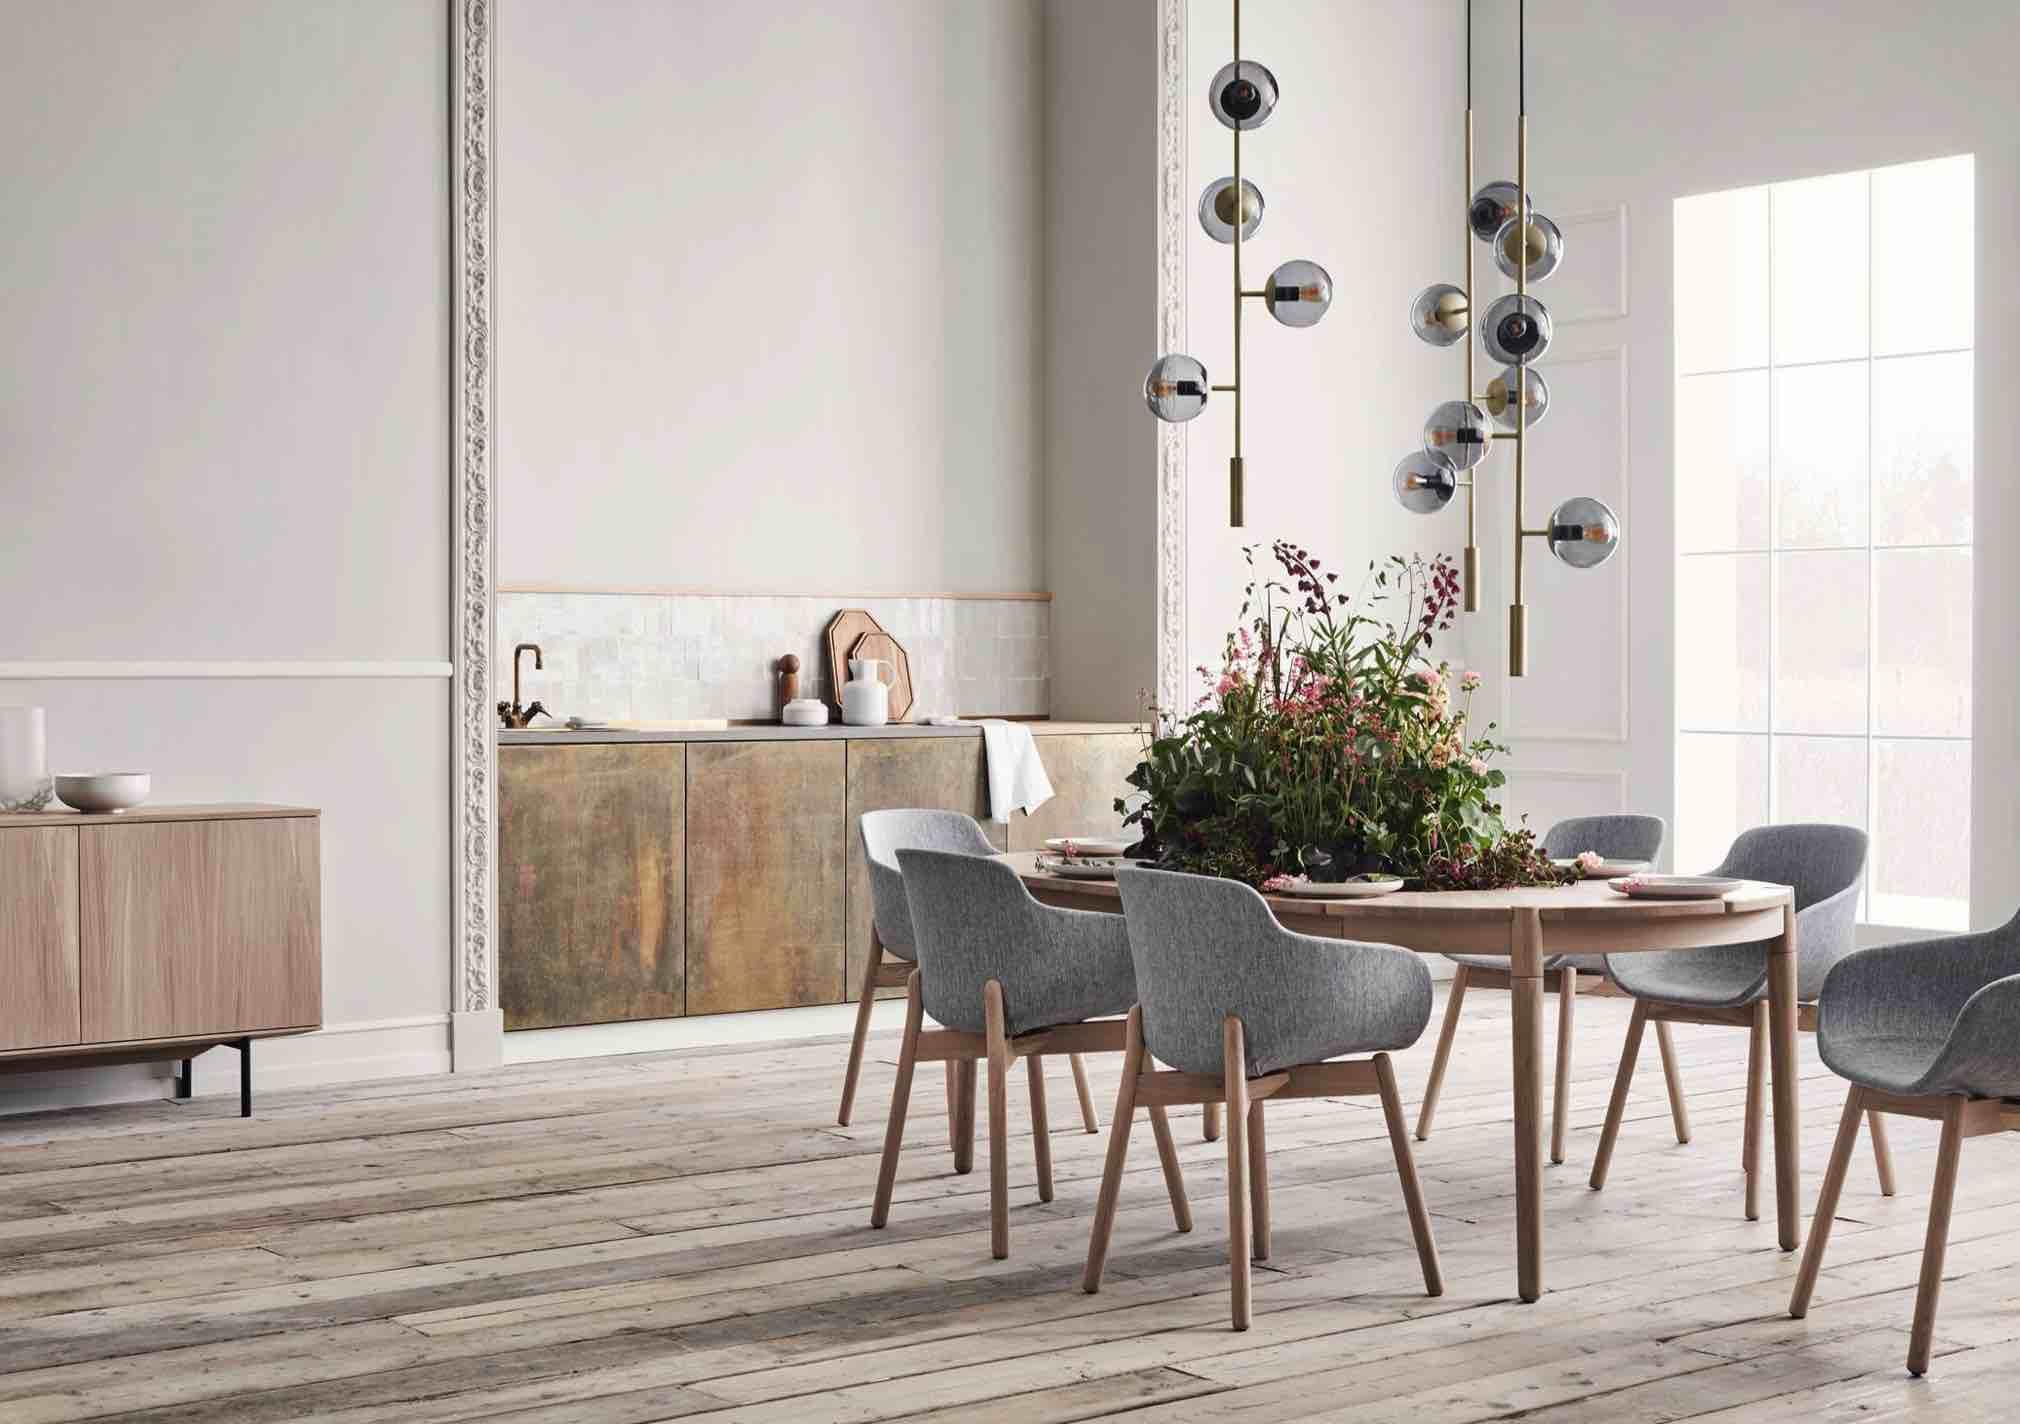 Bolia Ninove Sales dining tafels stoelen dressoirs verlichting